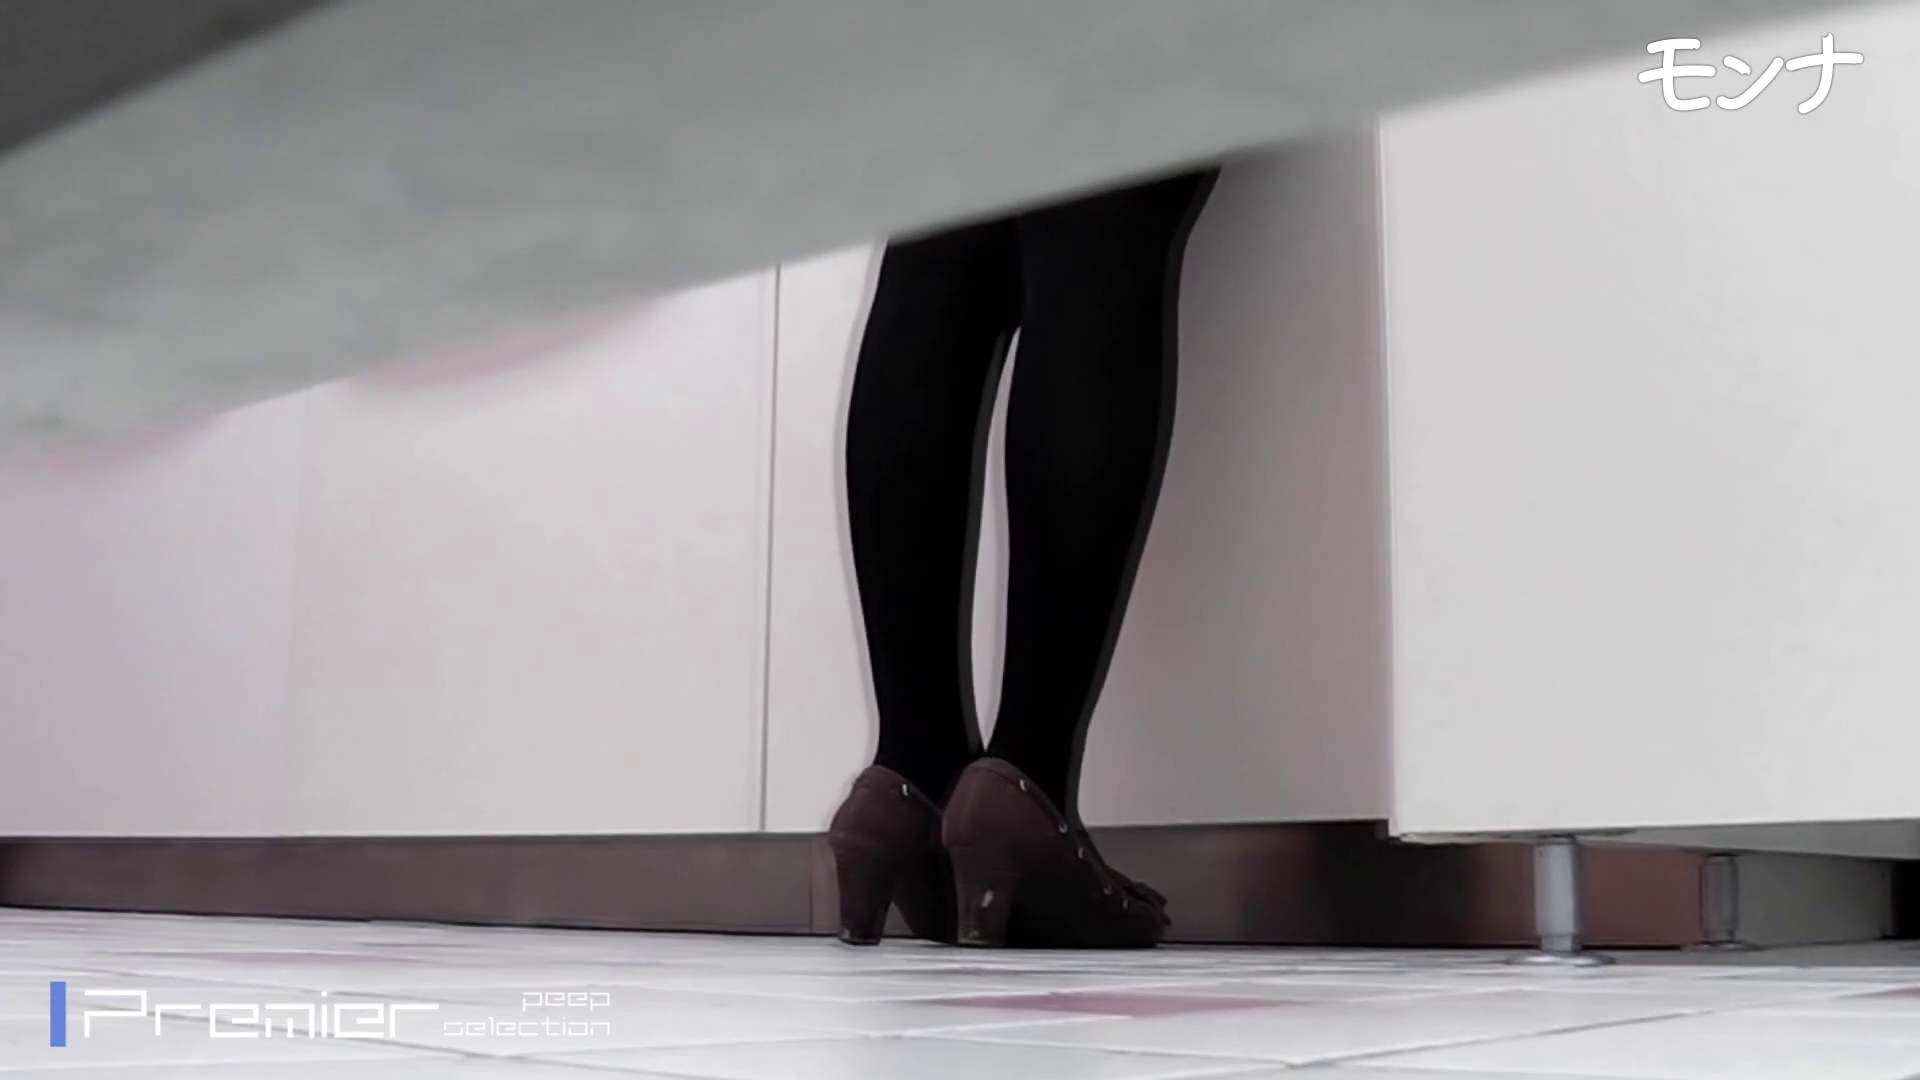 CM 悶絶シリーズ5 【美しい日本の未来 No.128】 むっちり体型 戯れ無修正画像 88画像 19